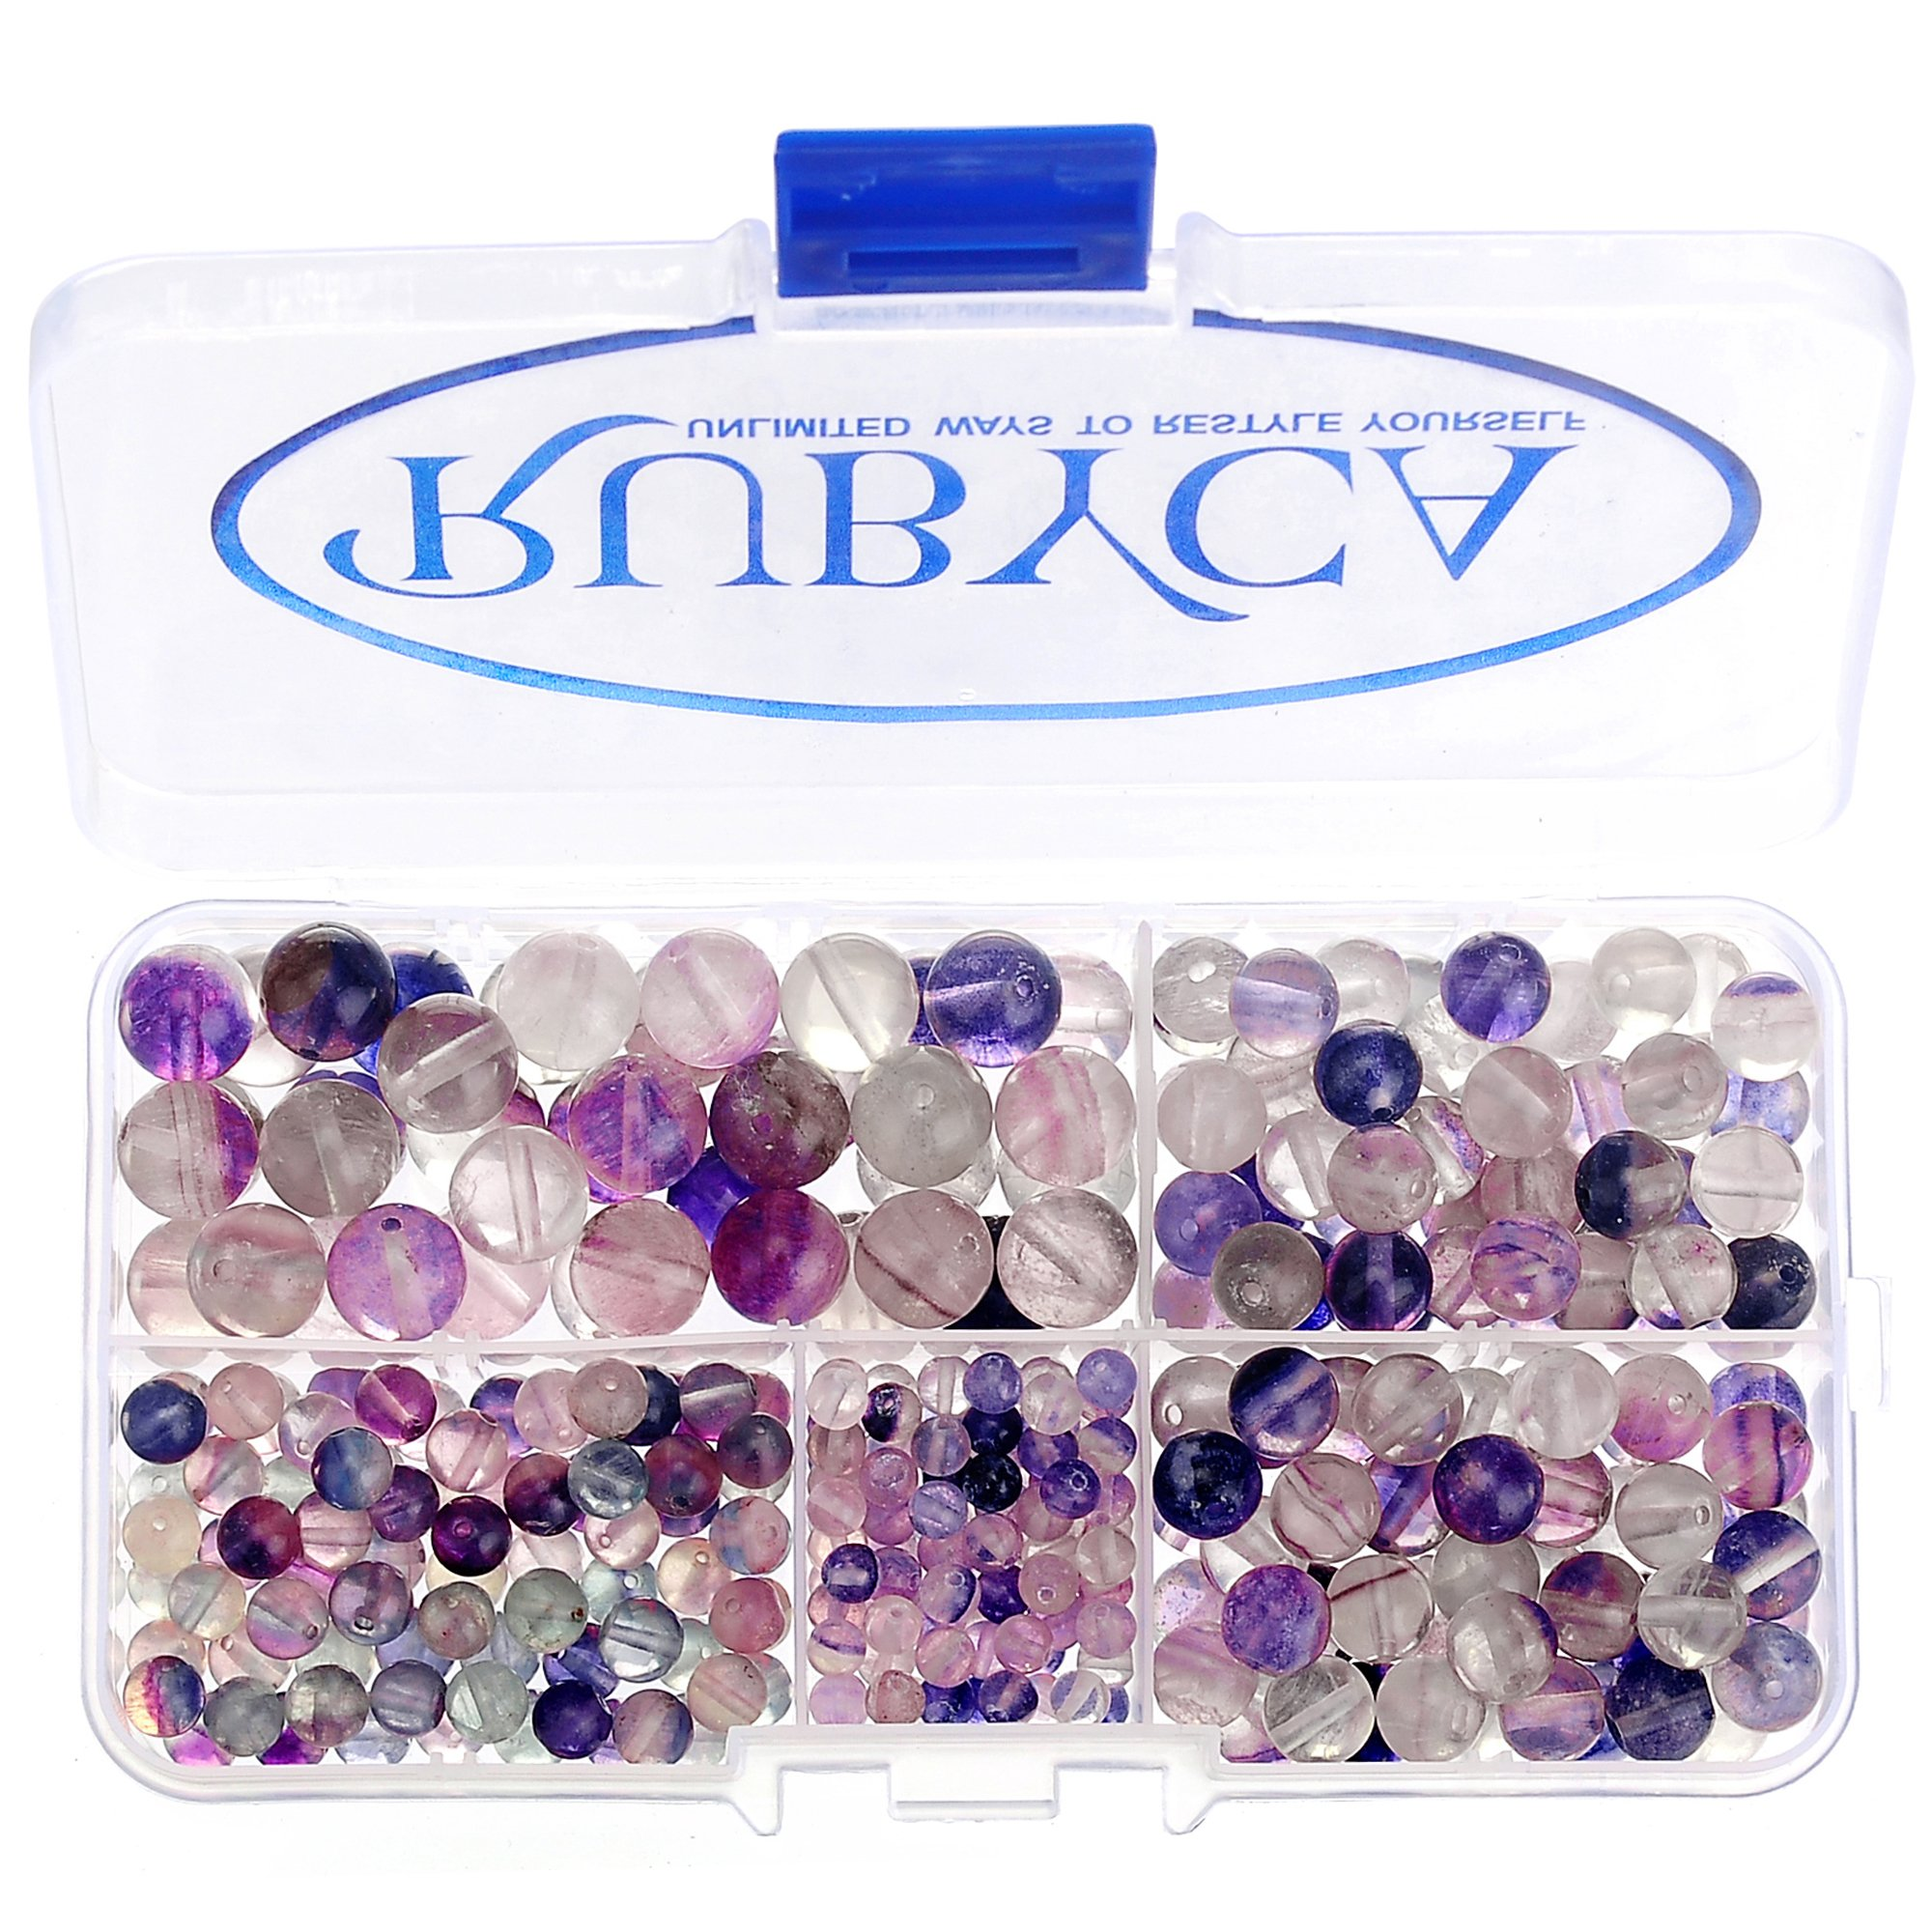 RUBYCA Natural Fluorite Gemstone Round Loose Bead Organizer Plastic Box Jewelry Making Mix Sizes